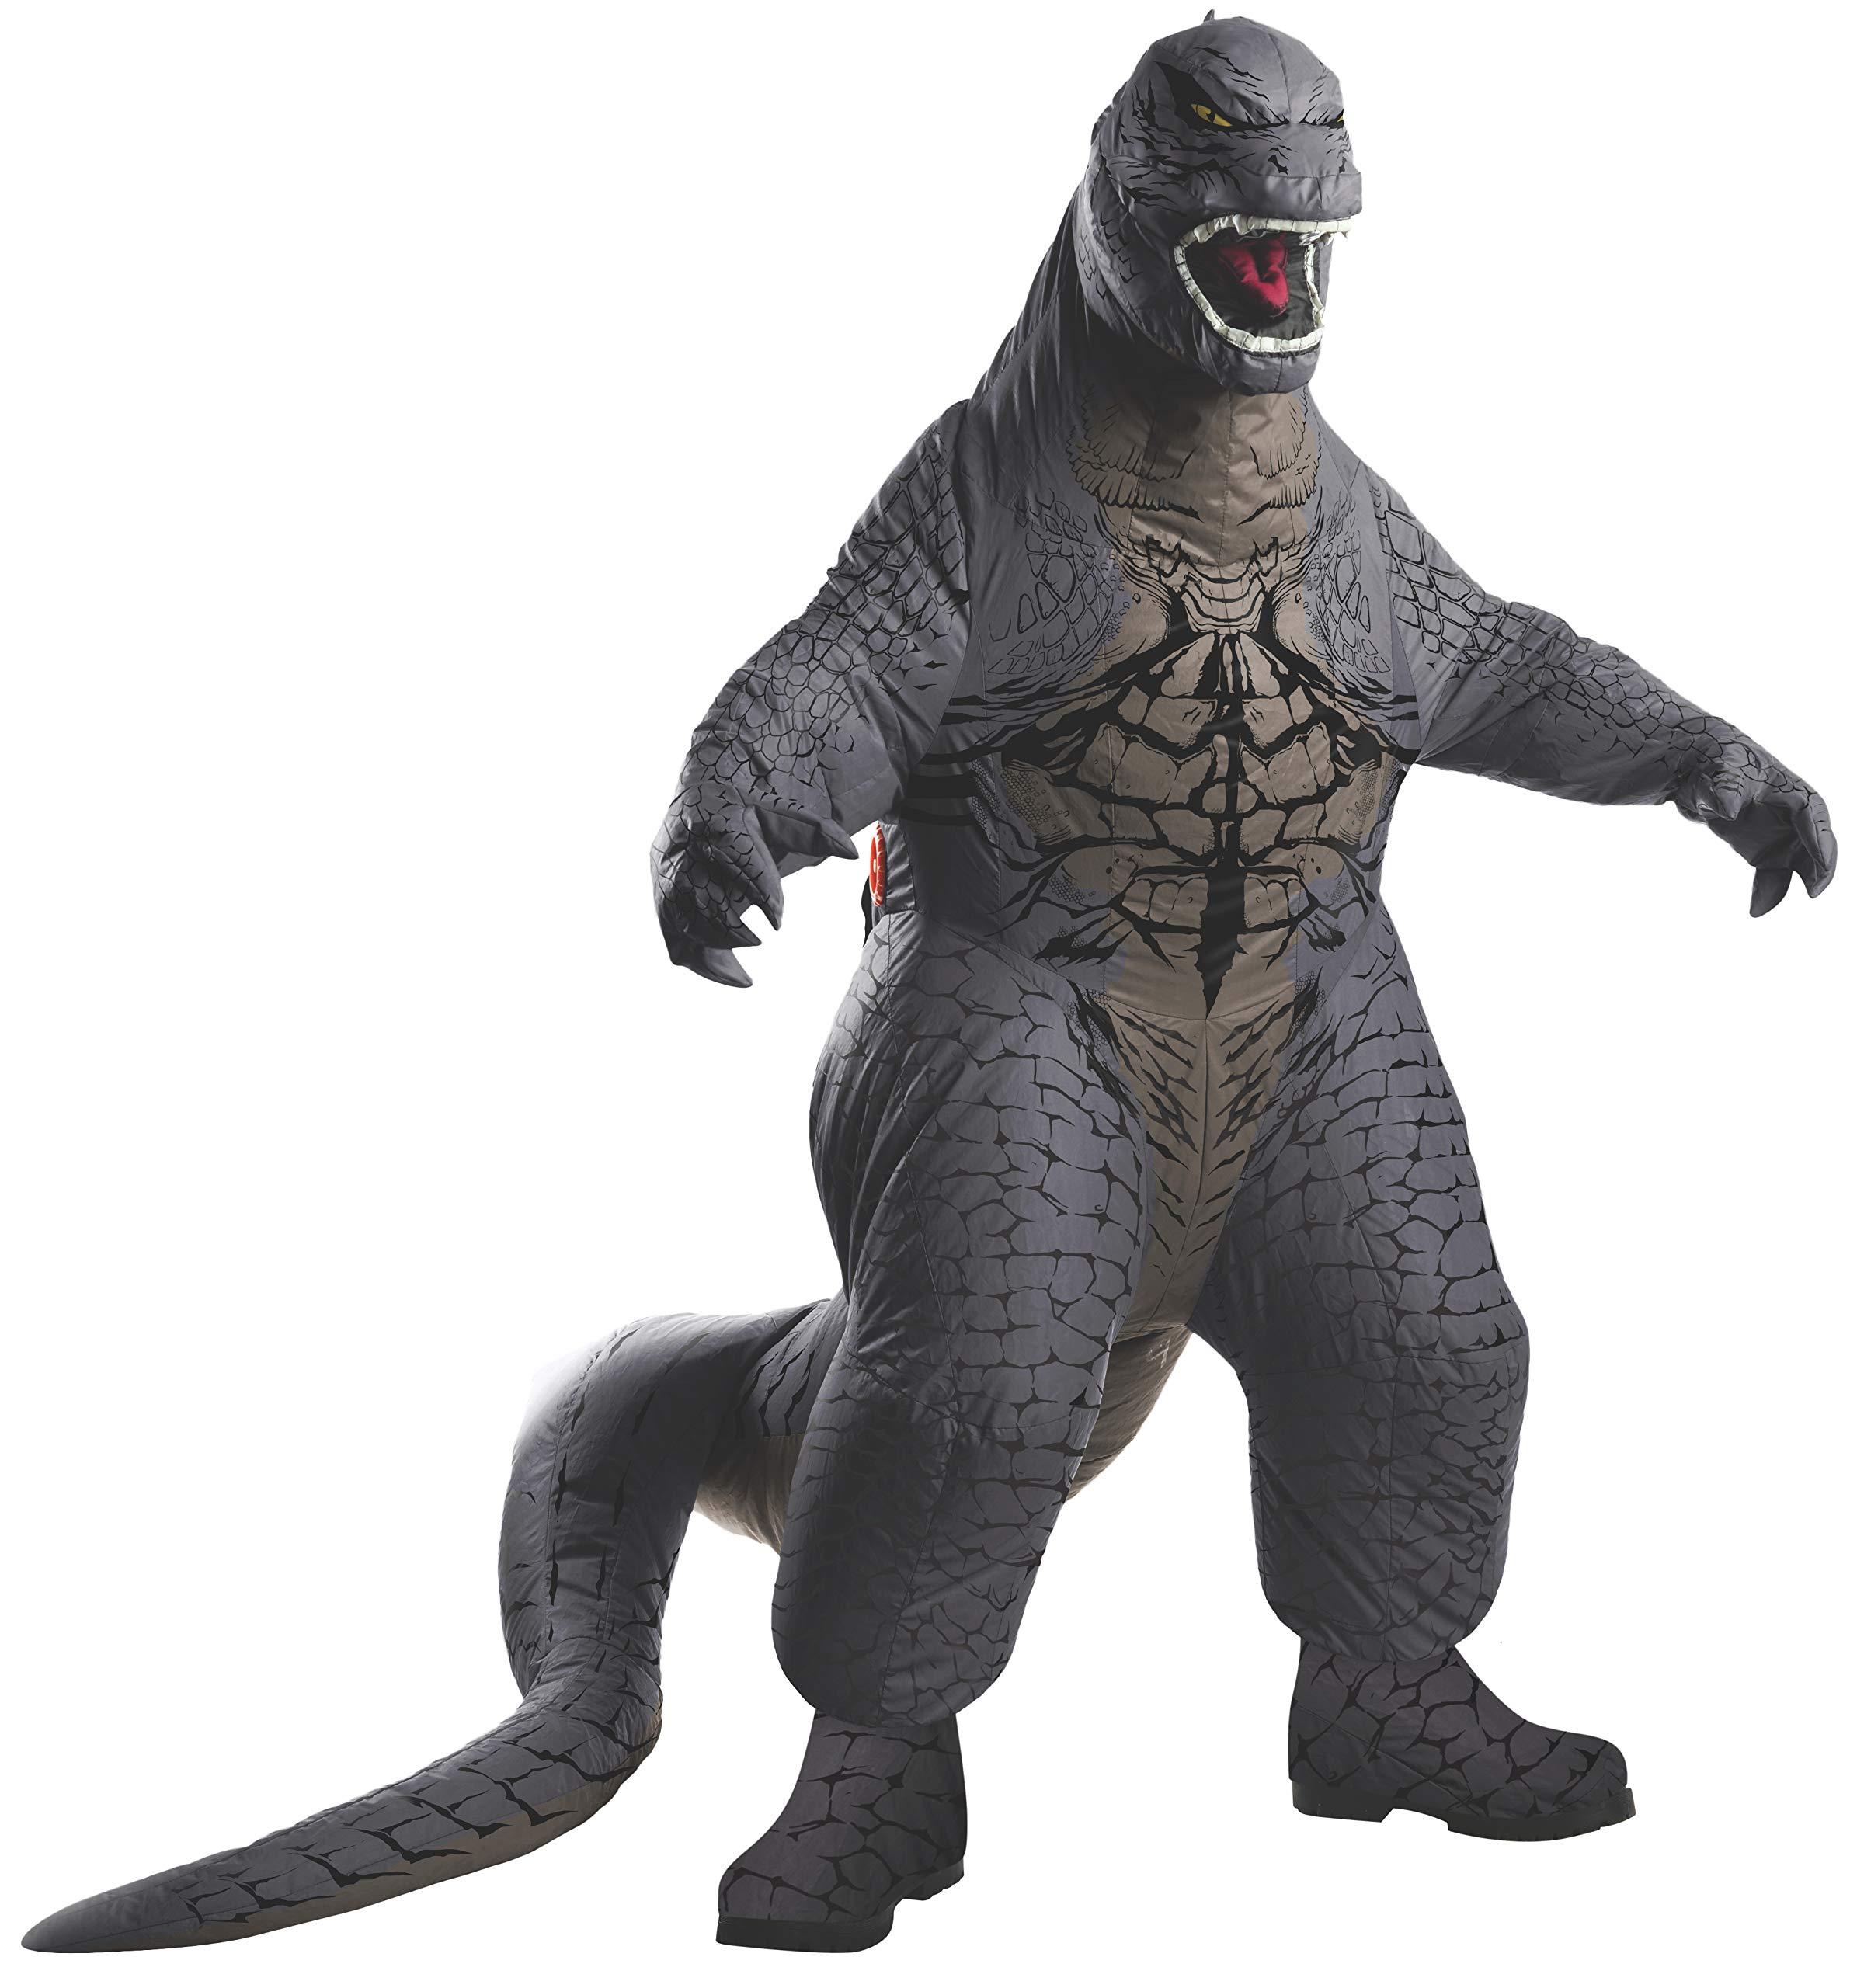 Godzilla King of The Monsters Child's Godzilla Inflatable Costume